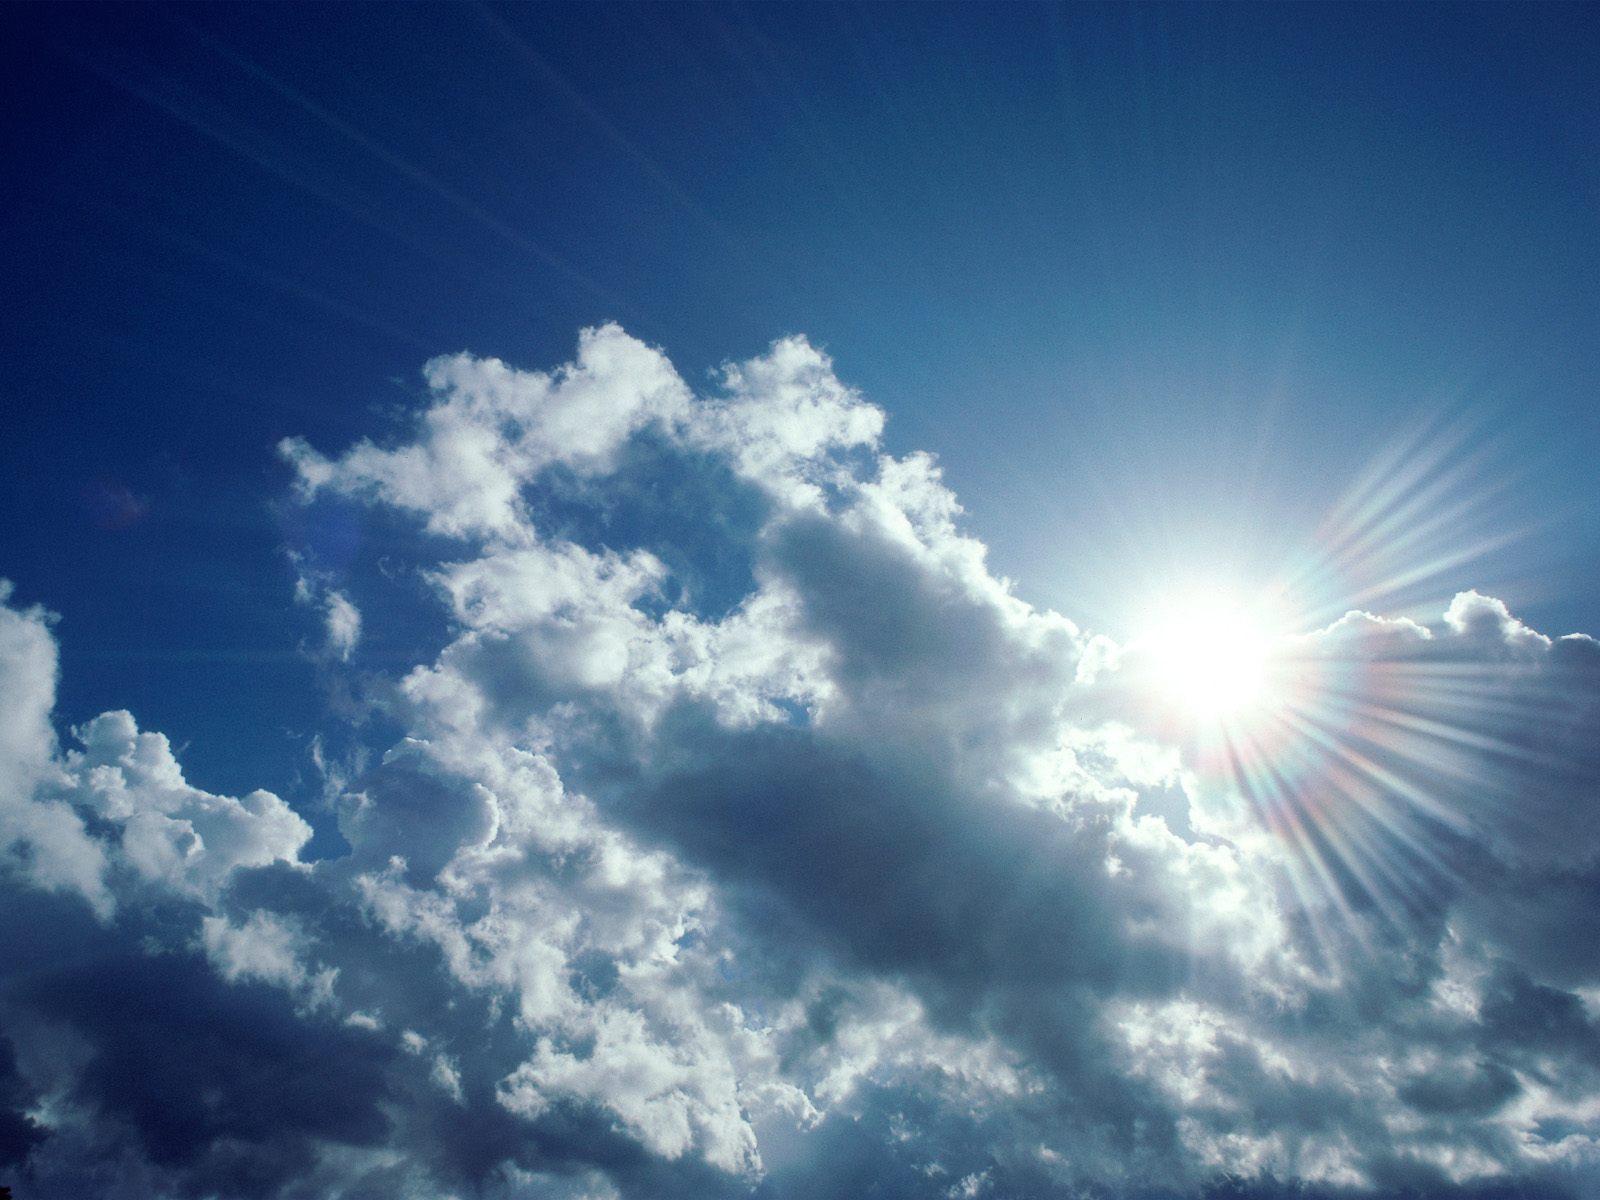 http://2.bp.blogspot.com/-EJbehr2ma4k/UPMzdgfPHXI/AAAAAAAASfo/gTA4R14qbKE/s1600/sunny_skies_wallpaper2.jpg